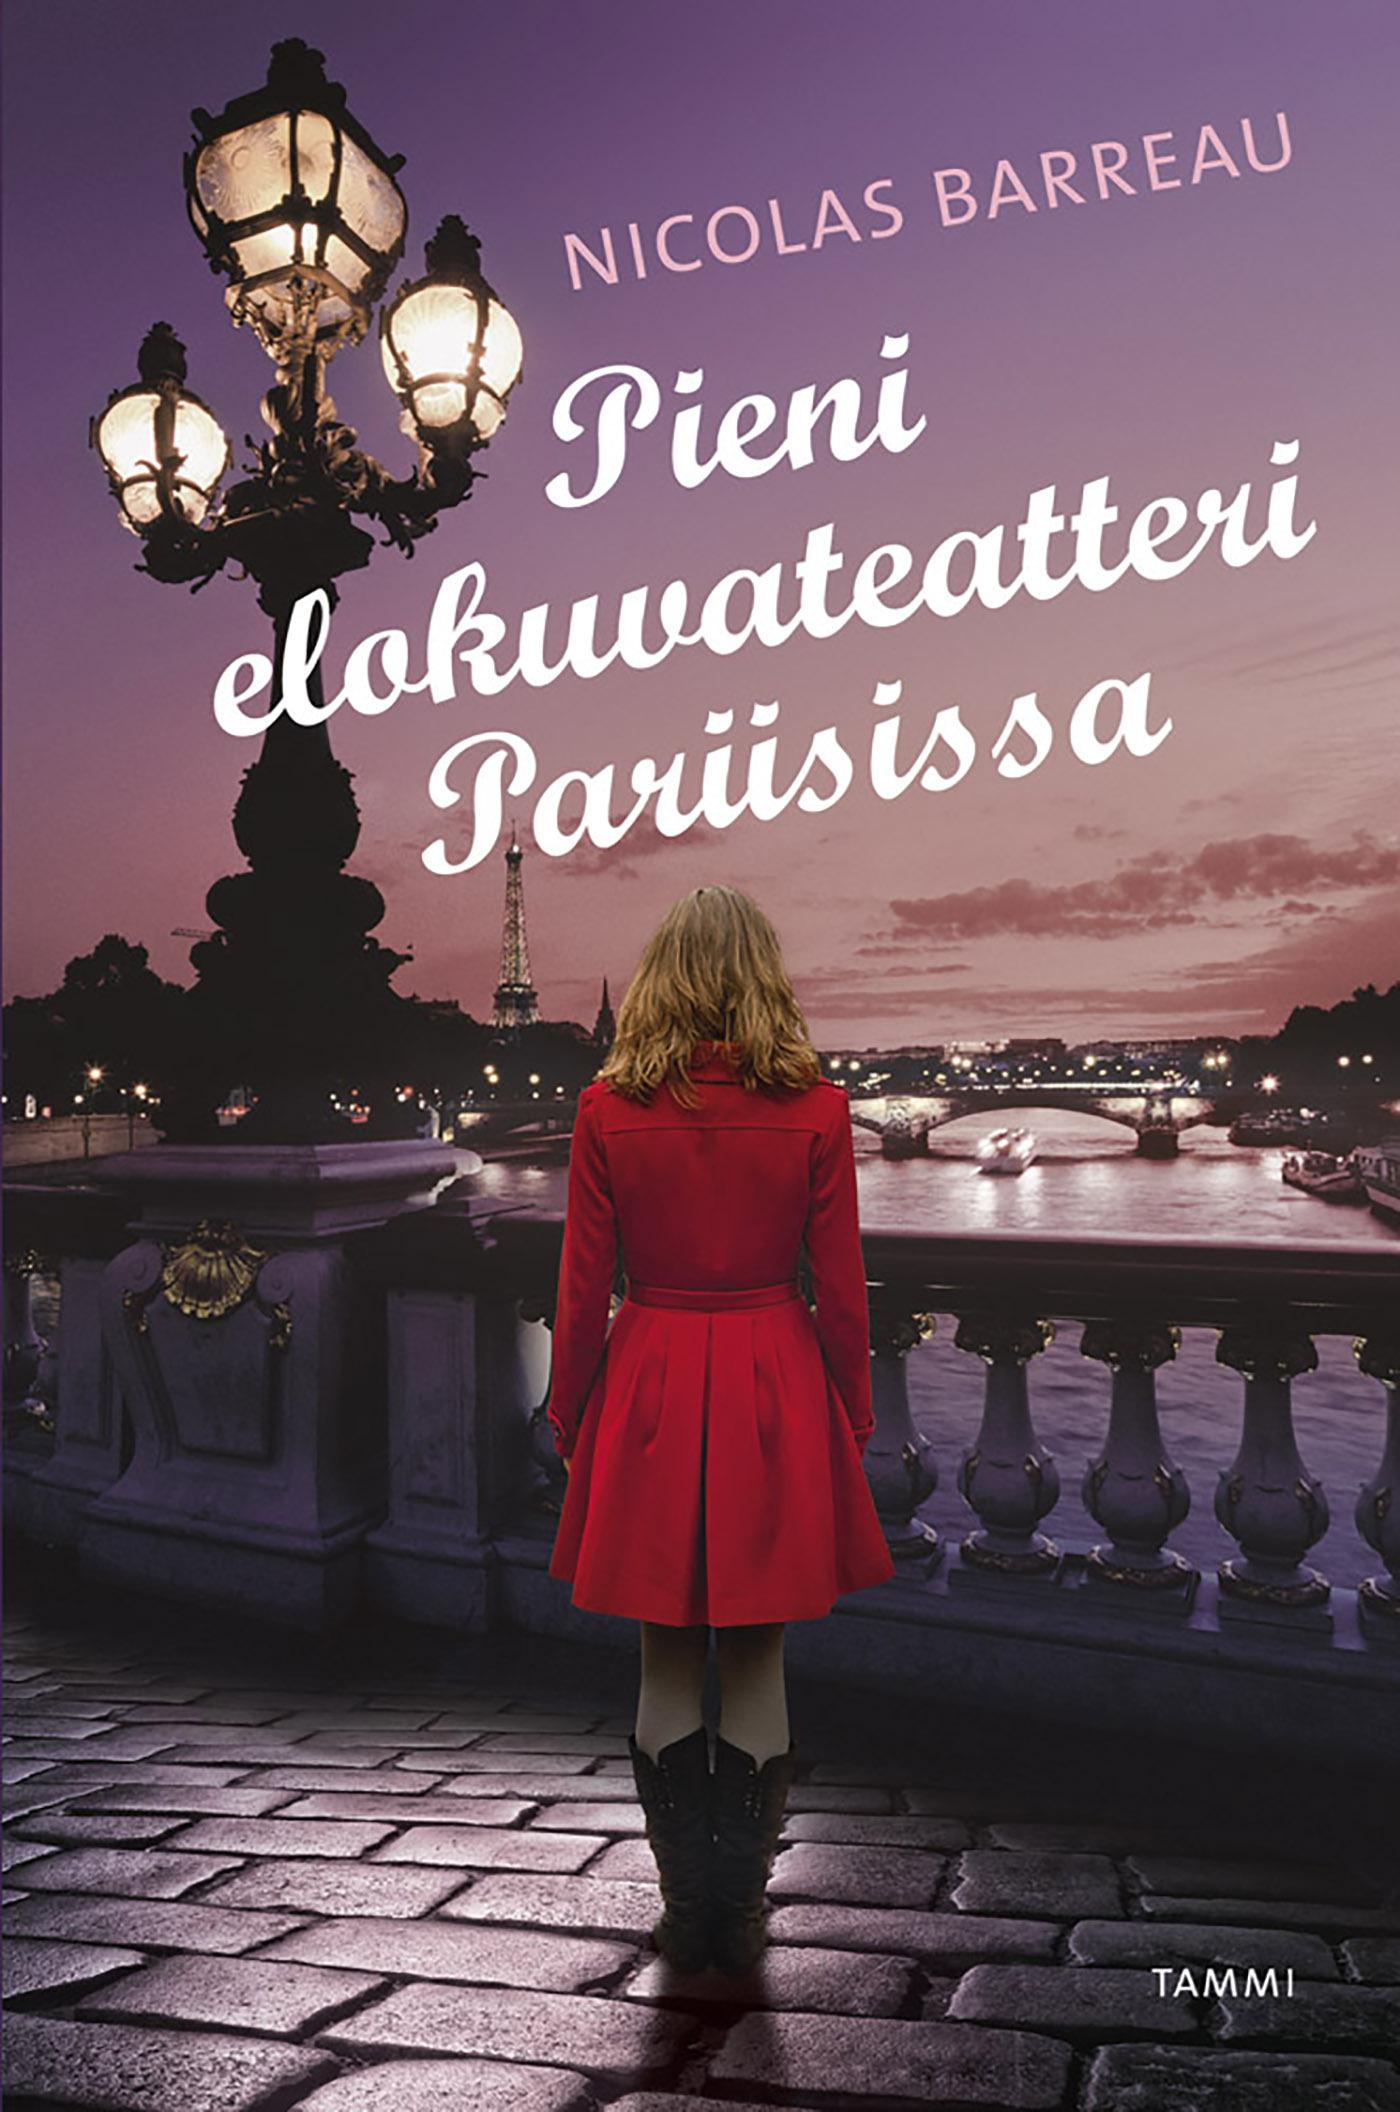 Barreau, Nicolas - Pieni elokuvateatteri Pariisissa, ebook